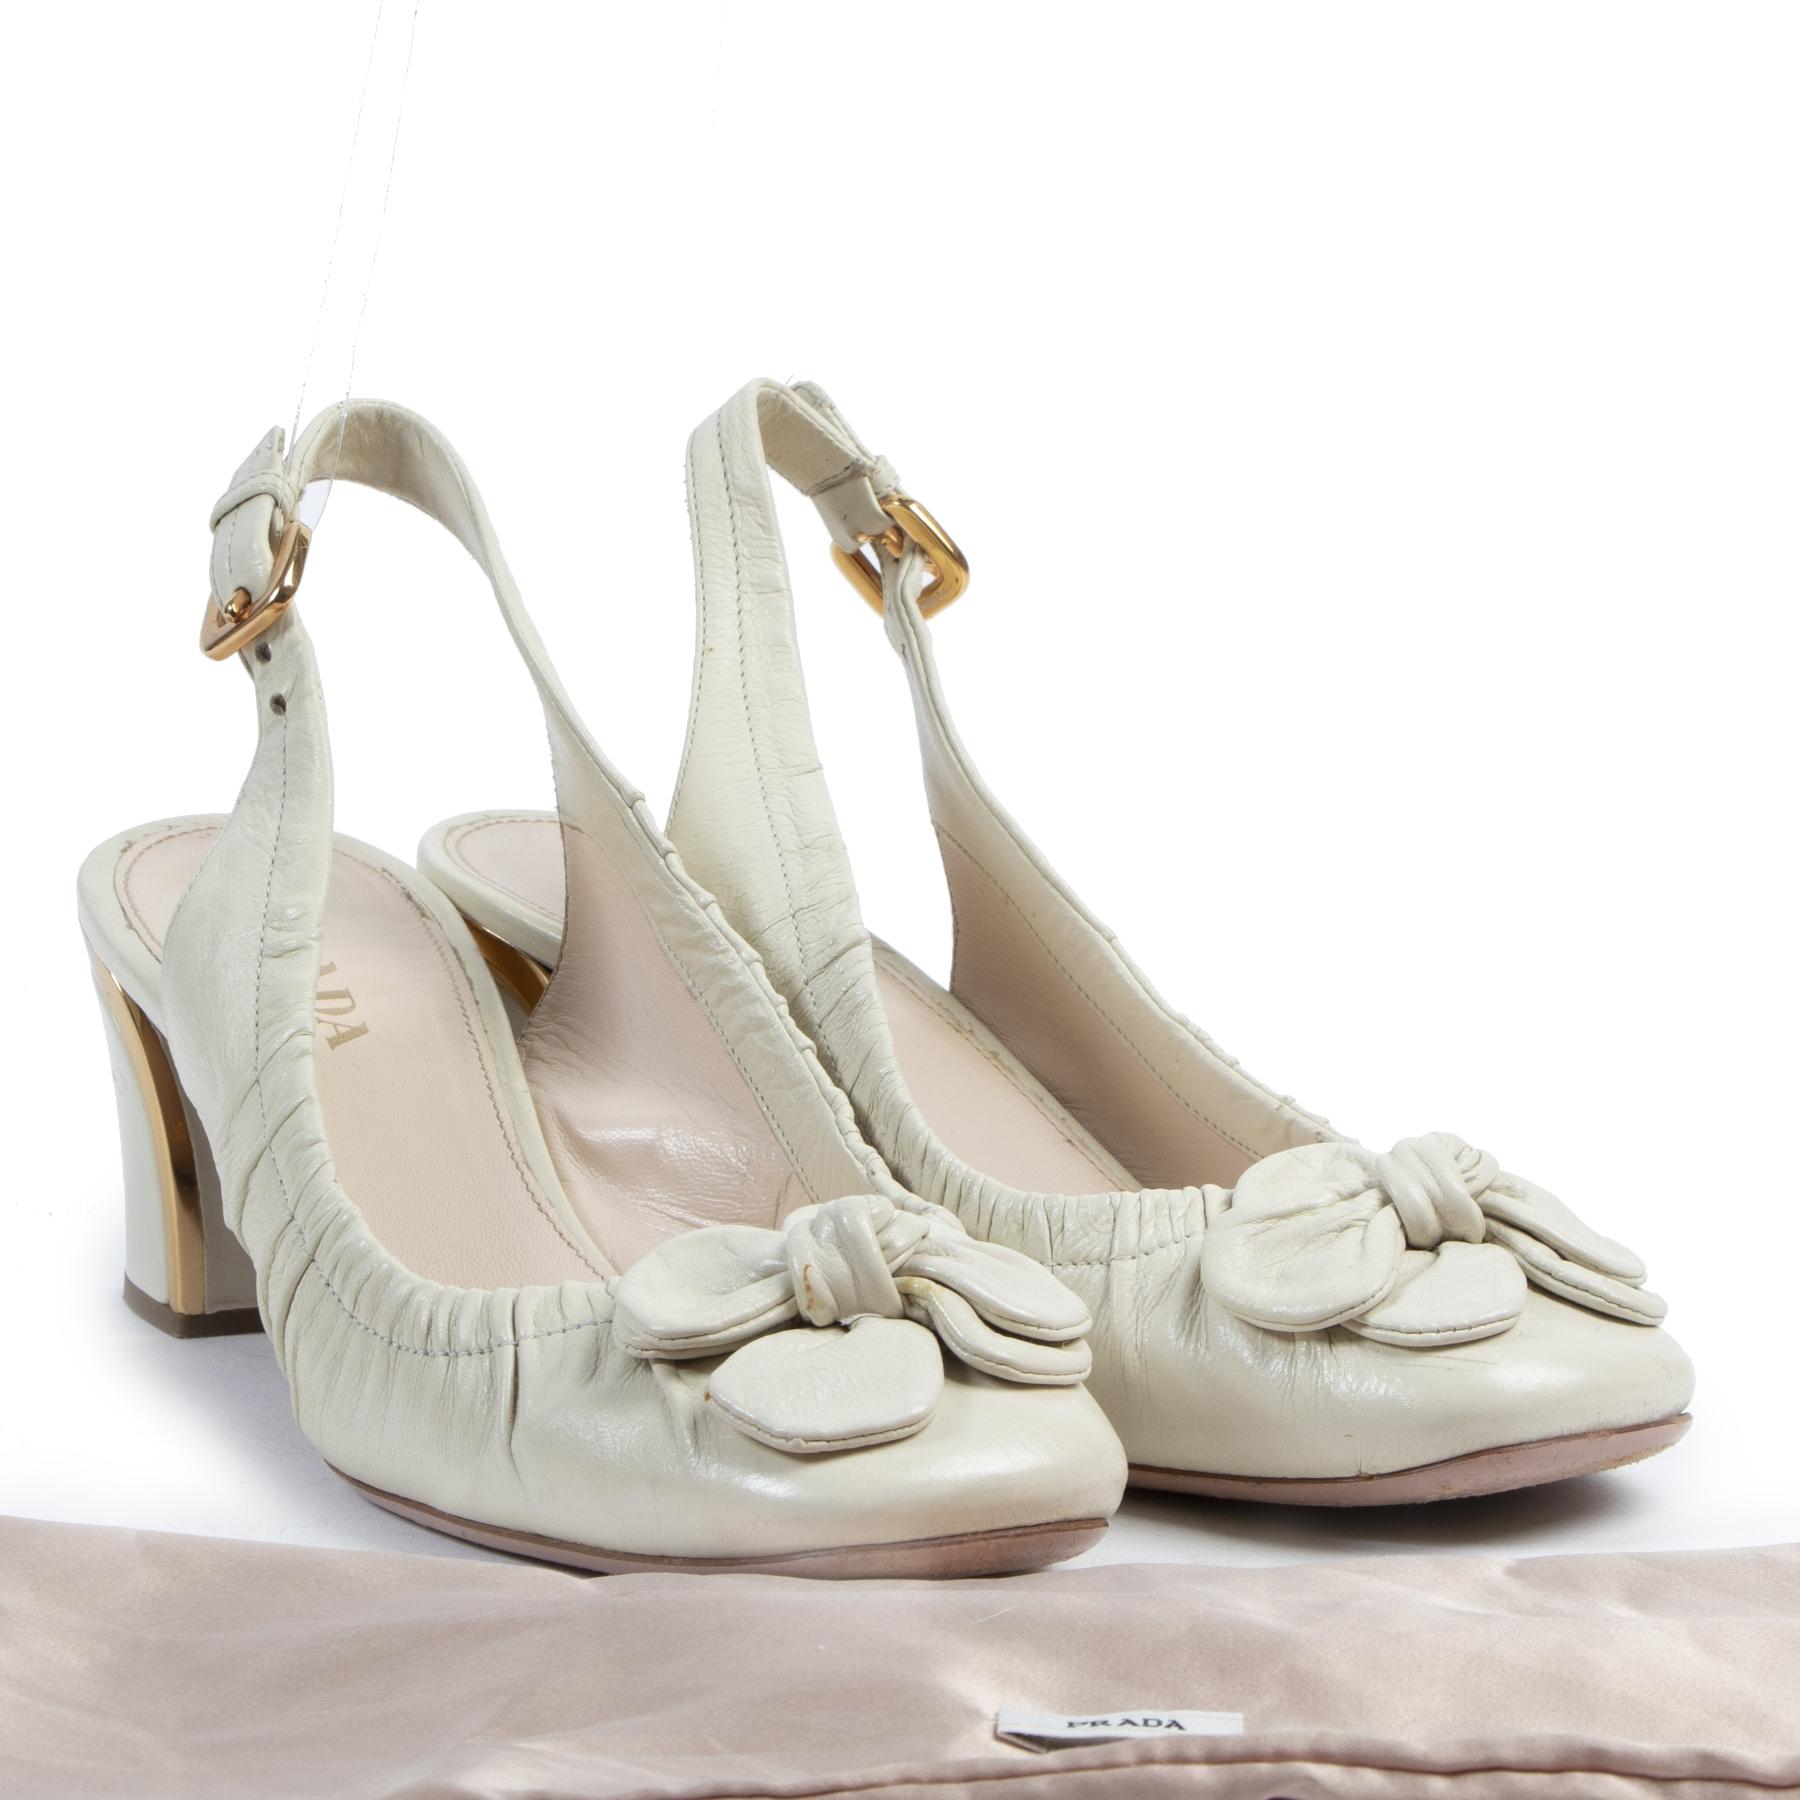 Authentieke tweedehands vintage Prada Cream Slingback Heels - Size 40 koop online webshop LabelLOV